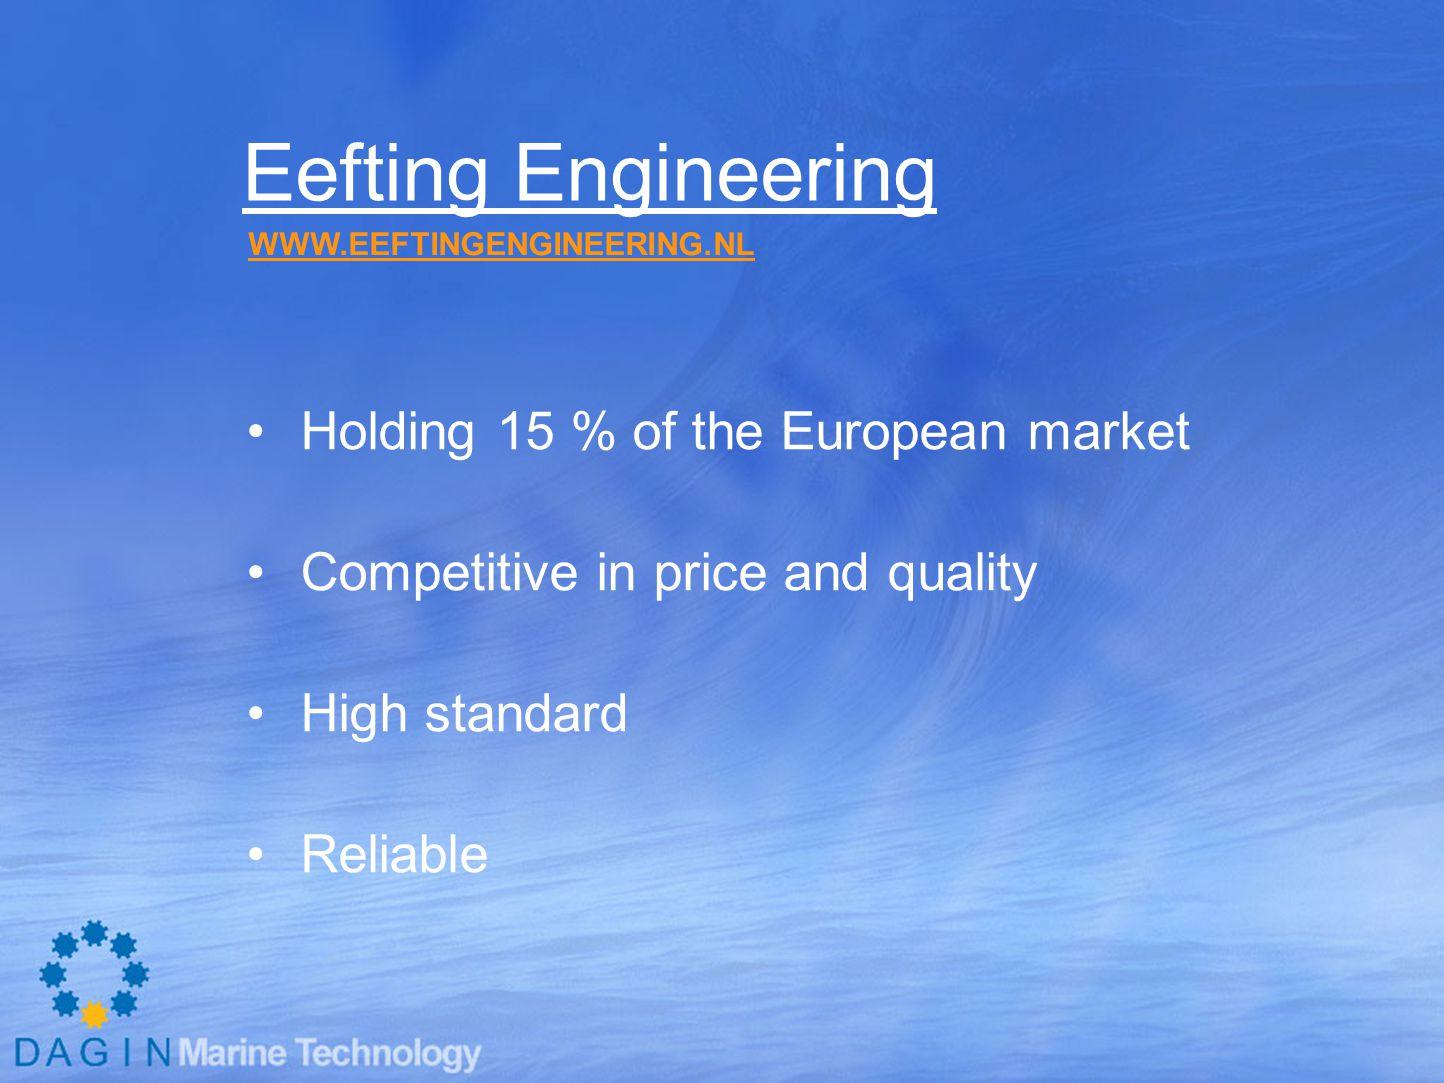 Eefting Engineering Holding 15 % of the European market